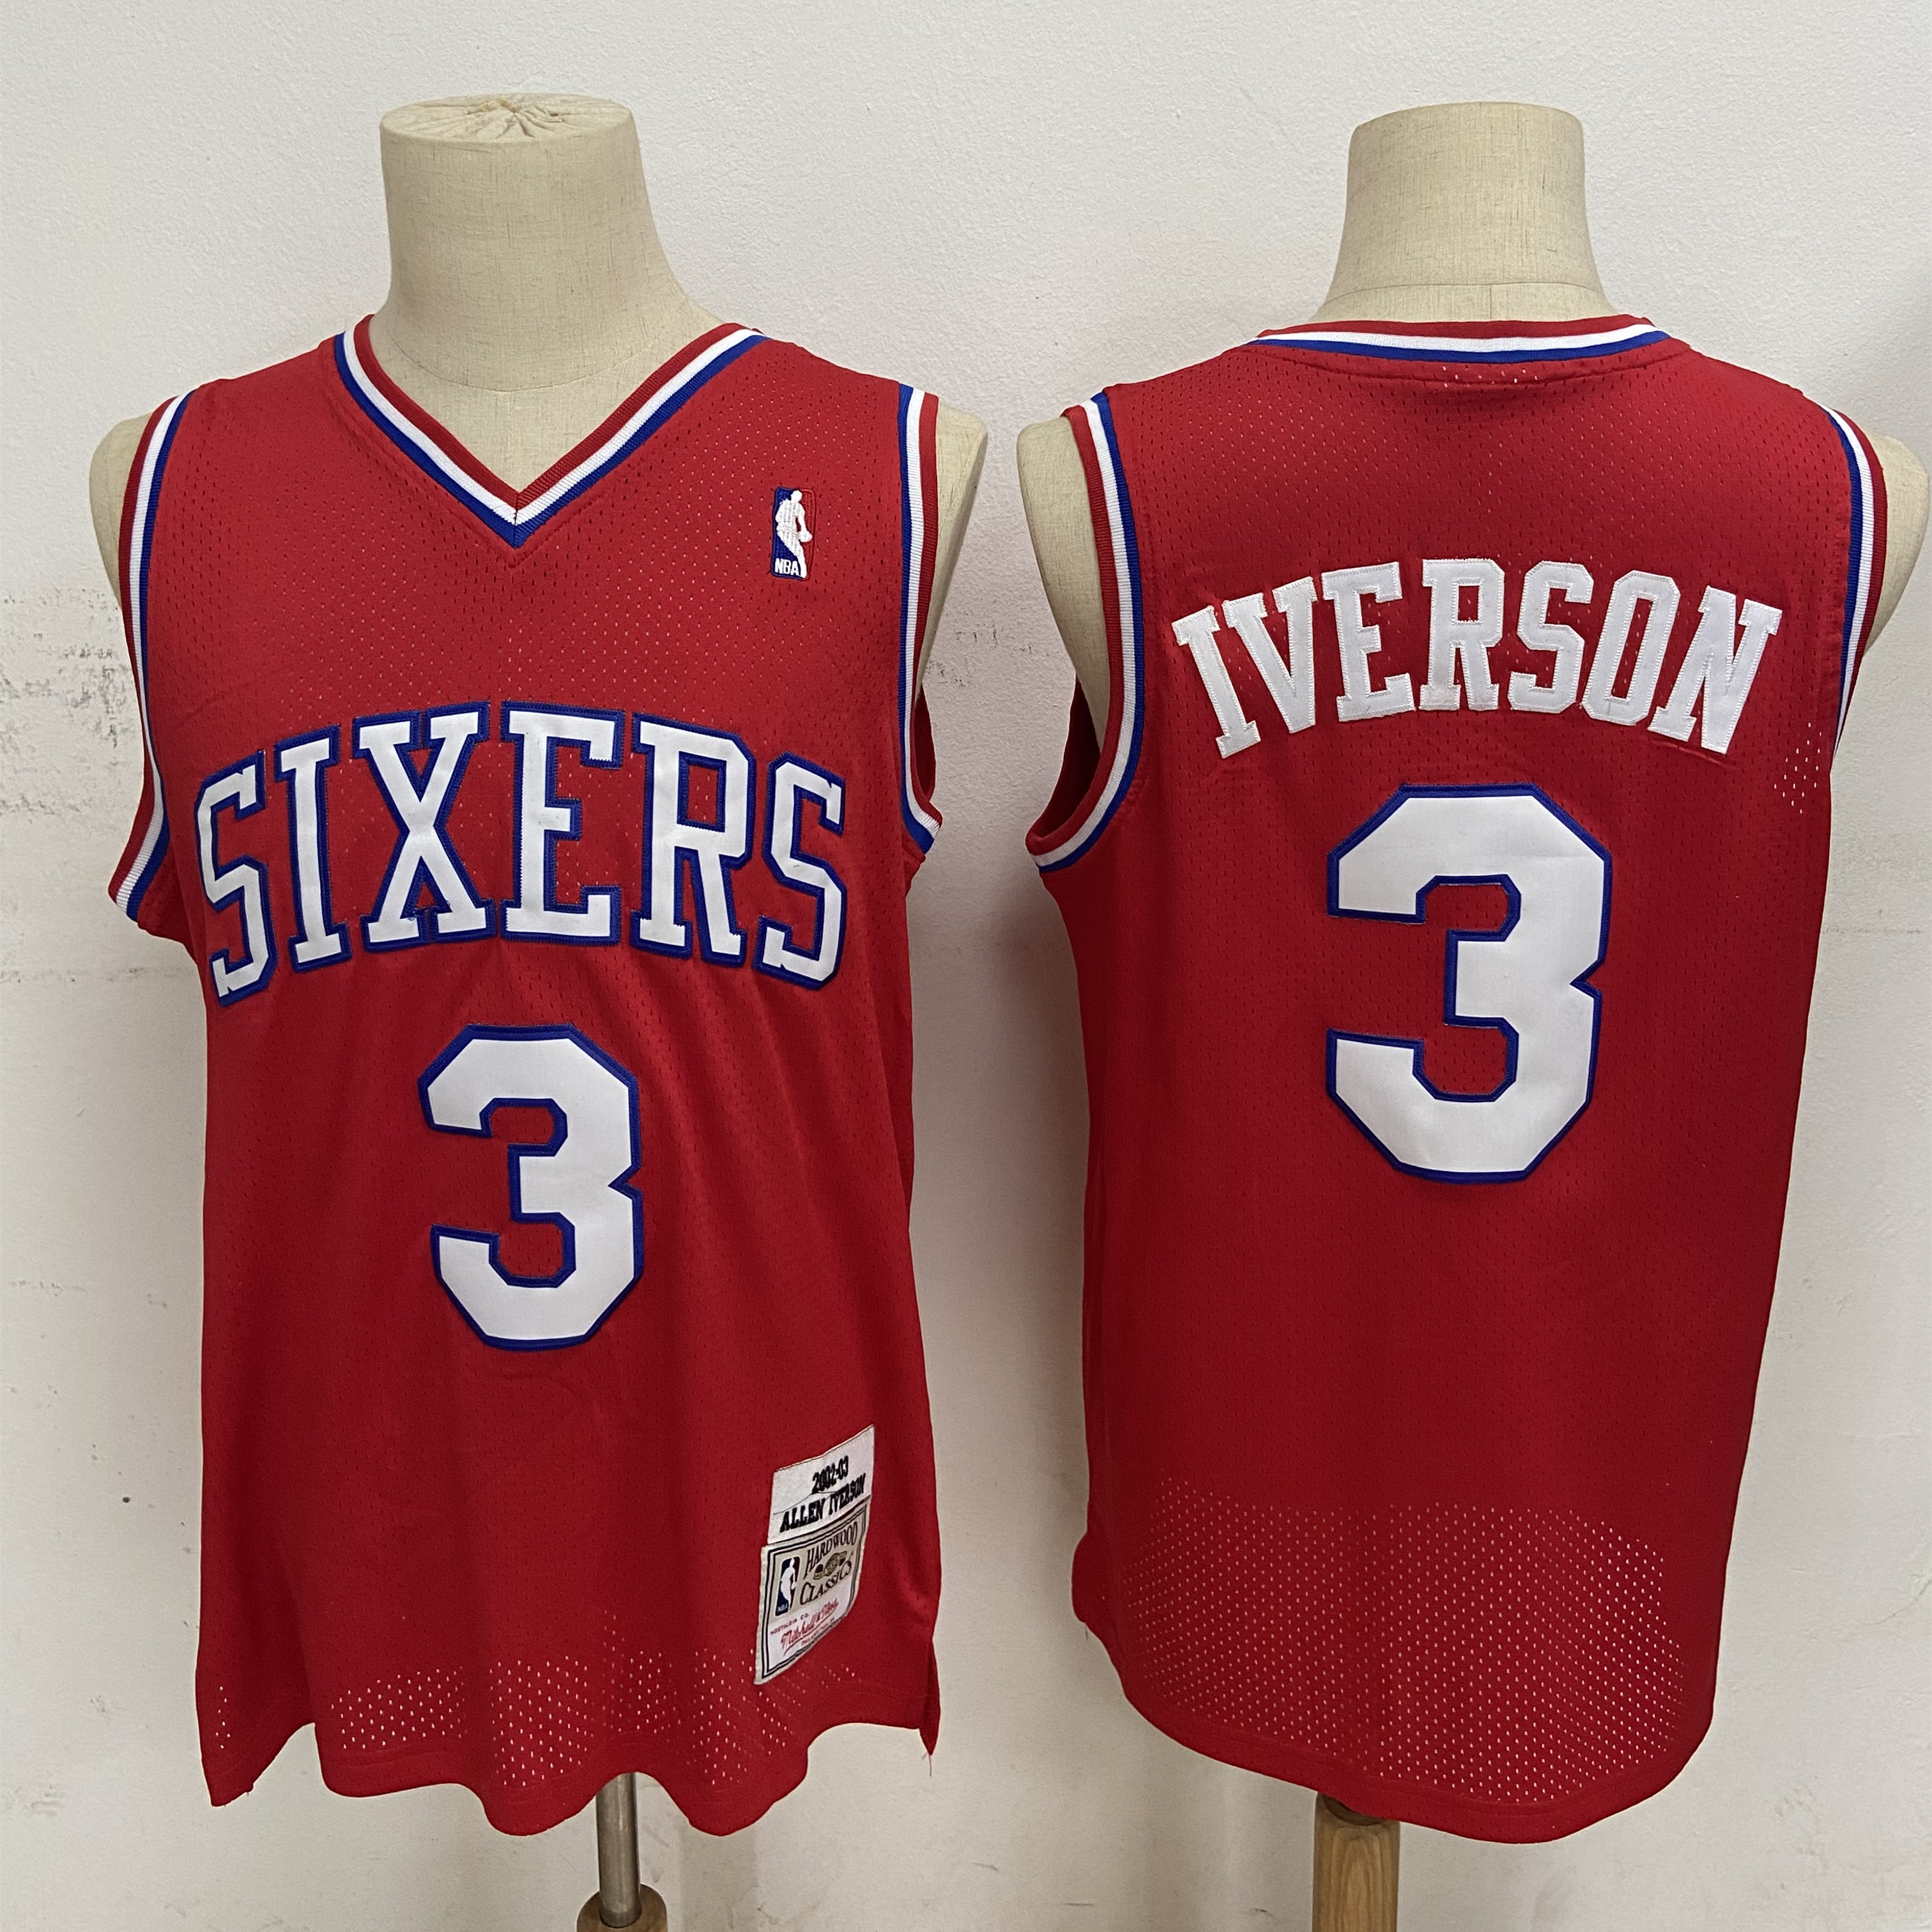 76ers 3 Allen Iverson Red 2002-03 Hardwood Classics Jersey